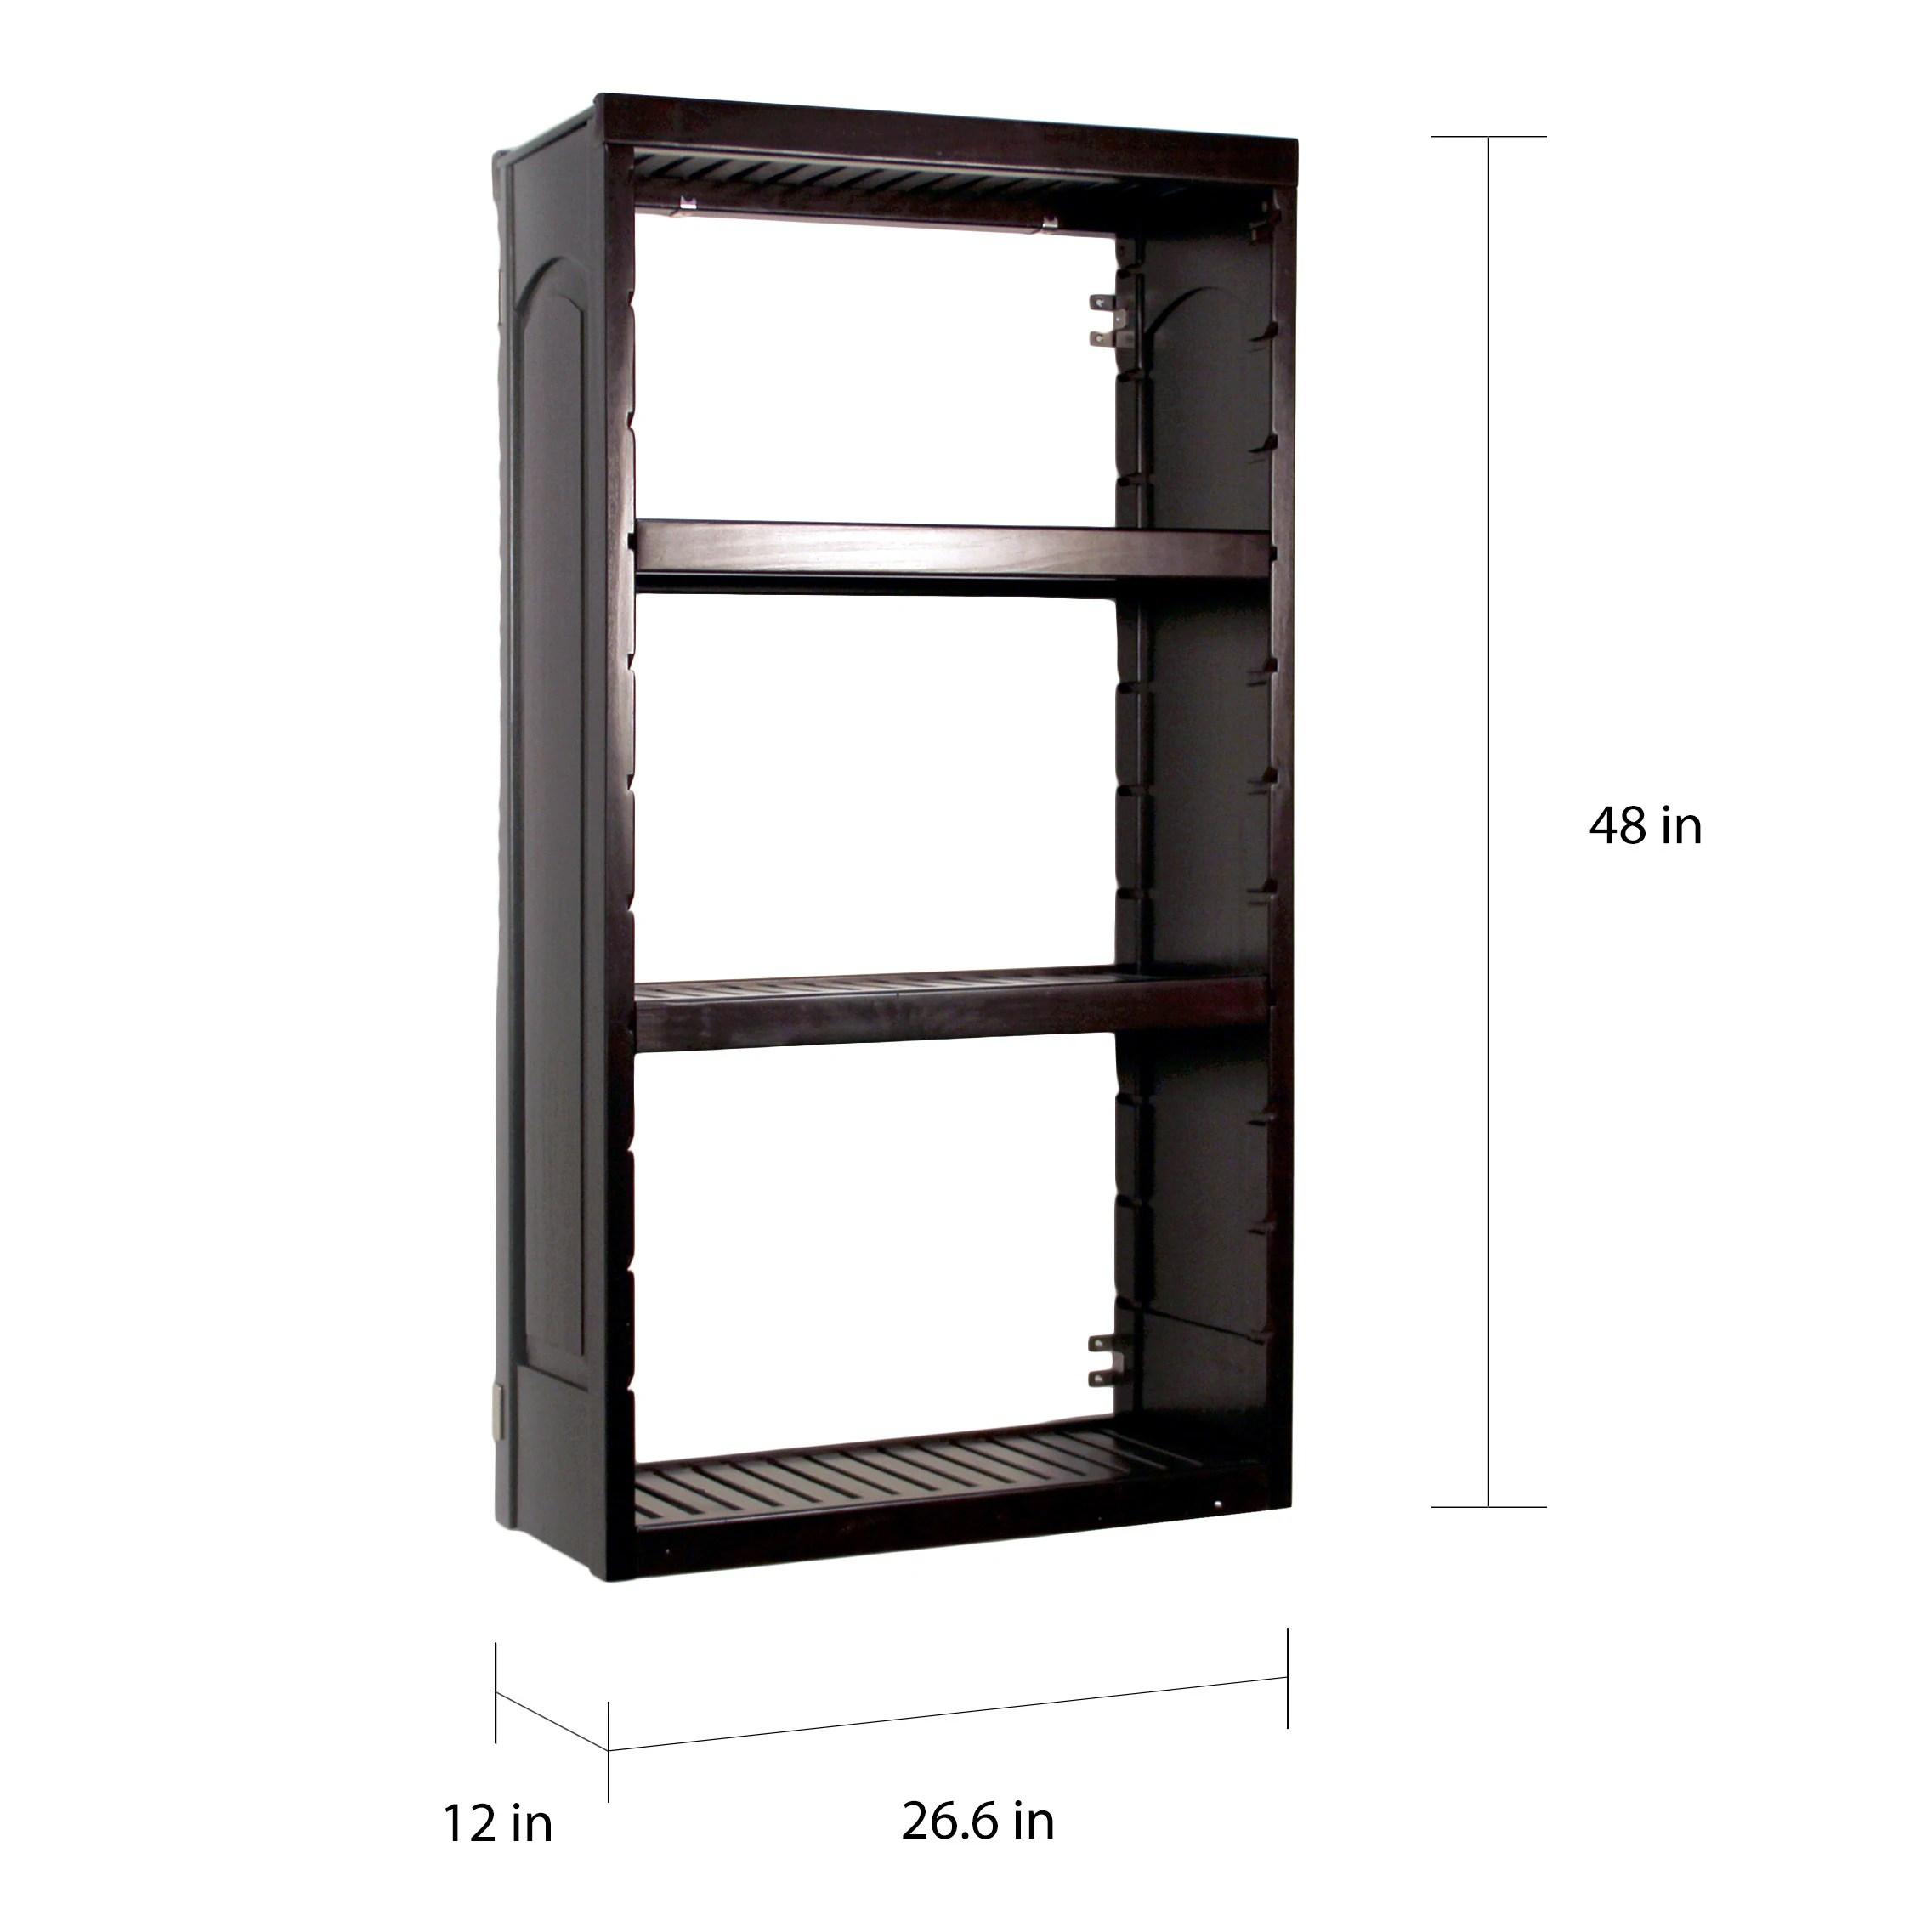 John Louis Woodcrest Espresso Finish 12 Inch Deep Stand Alone Tower Kit